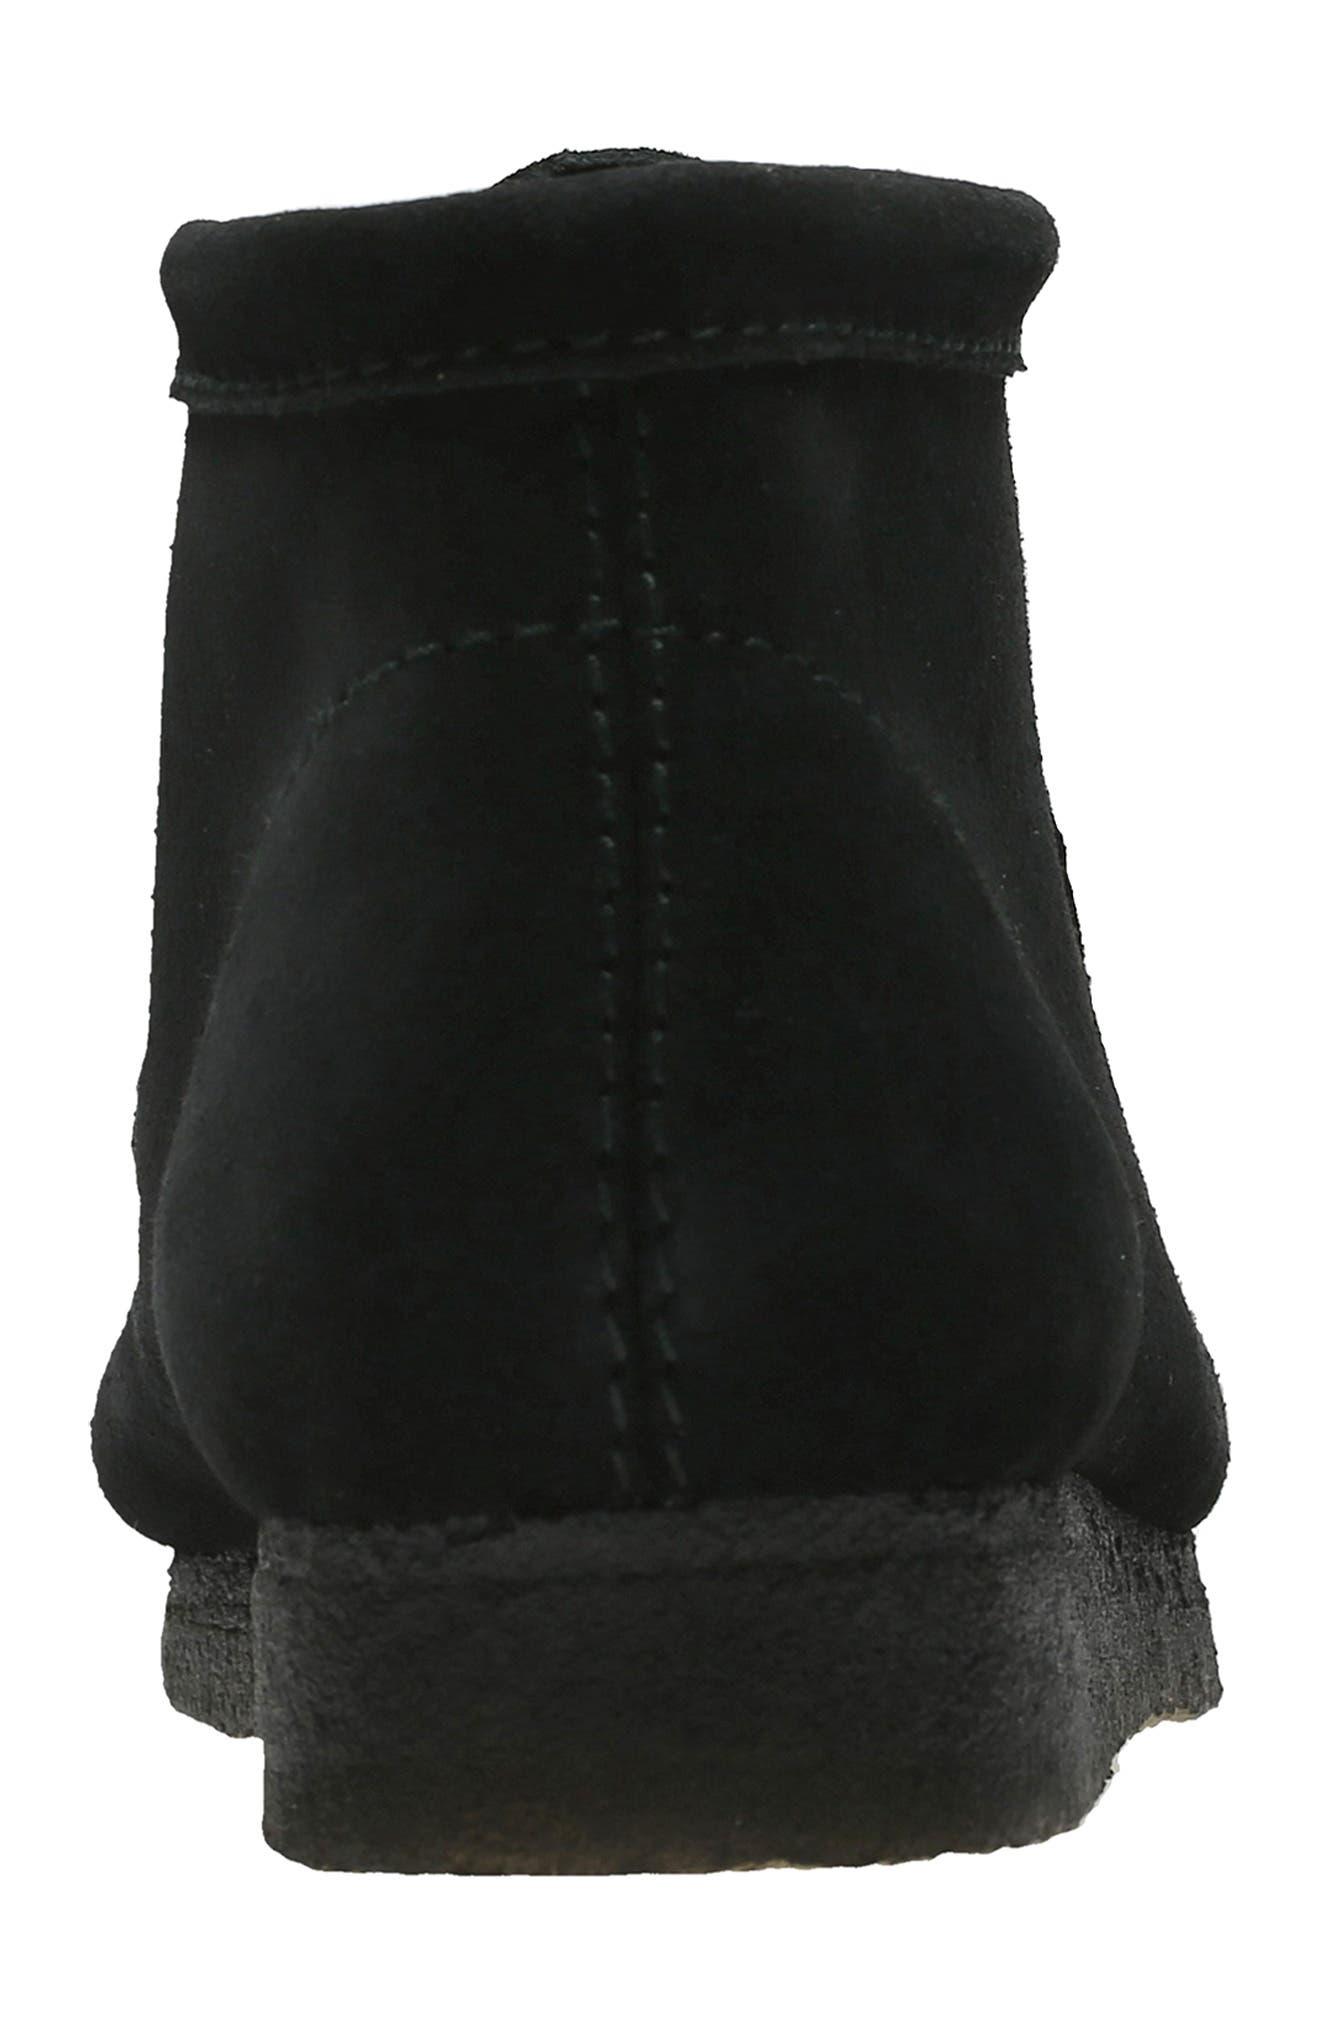 CLARKS<SUP>®</SUP>, Originals Wallabee Boot, Alternate thumbnail 6, color, BLACK SUEDE